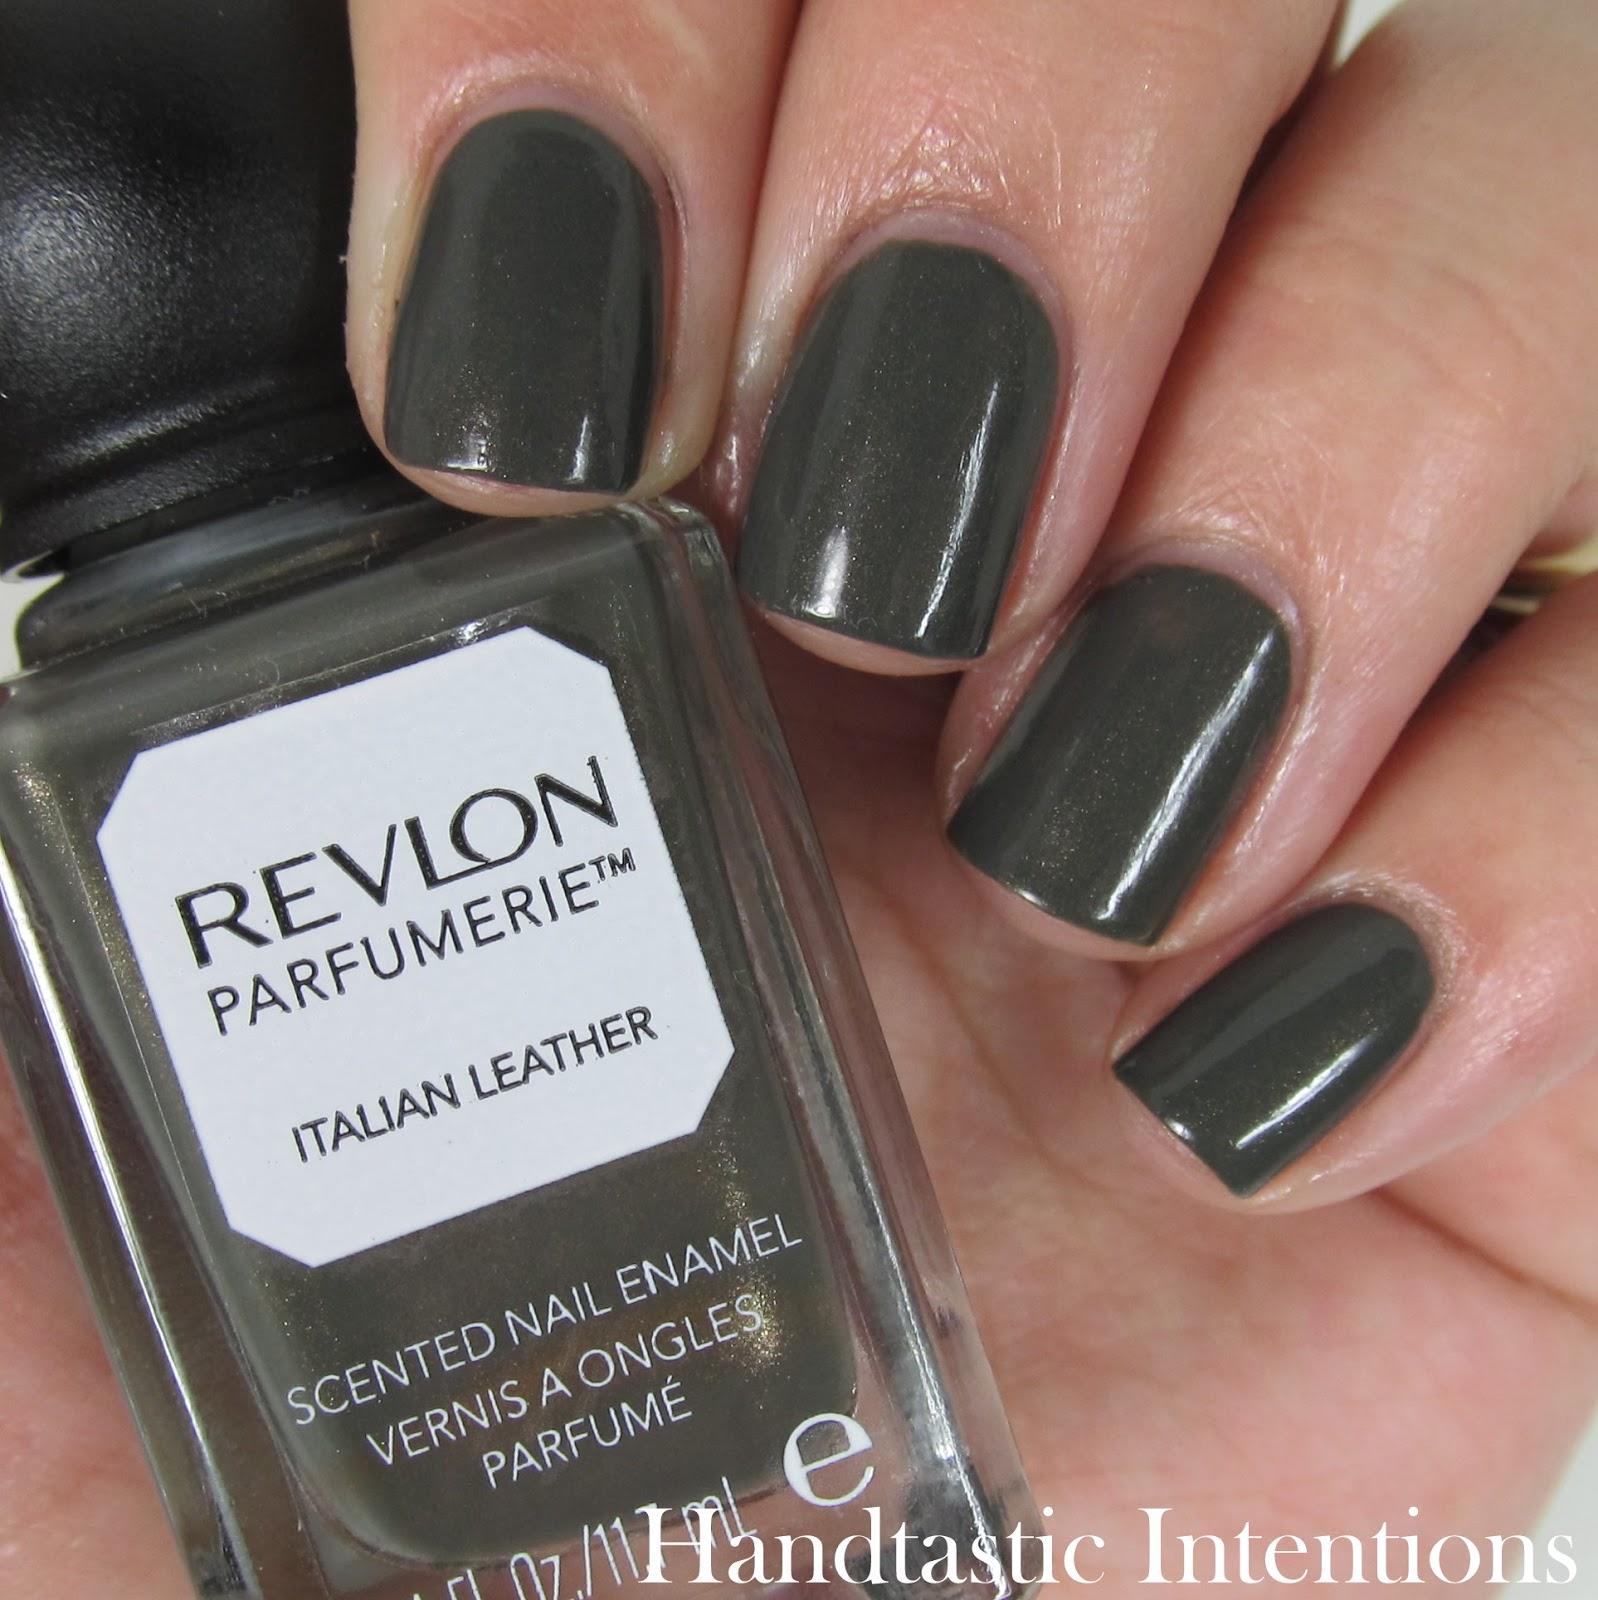 Revlon-Parfumerie-Italian-Leather-Review